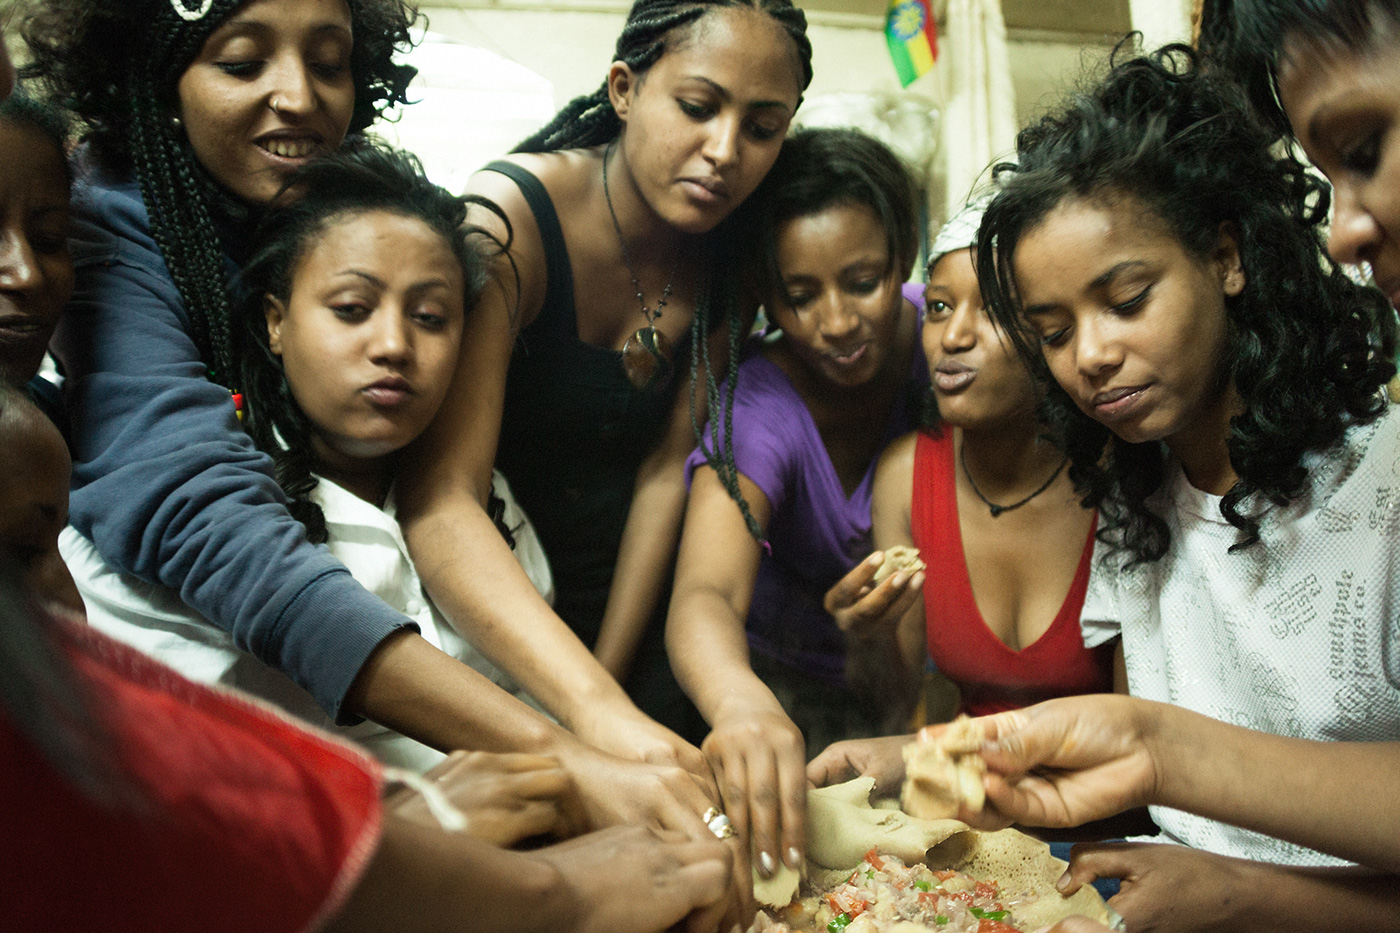 Addis ababa prostitutes online